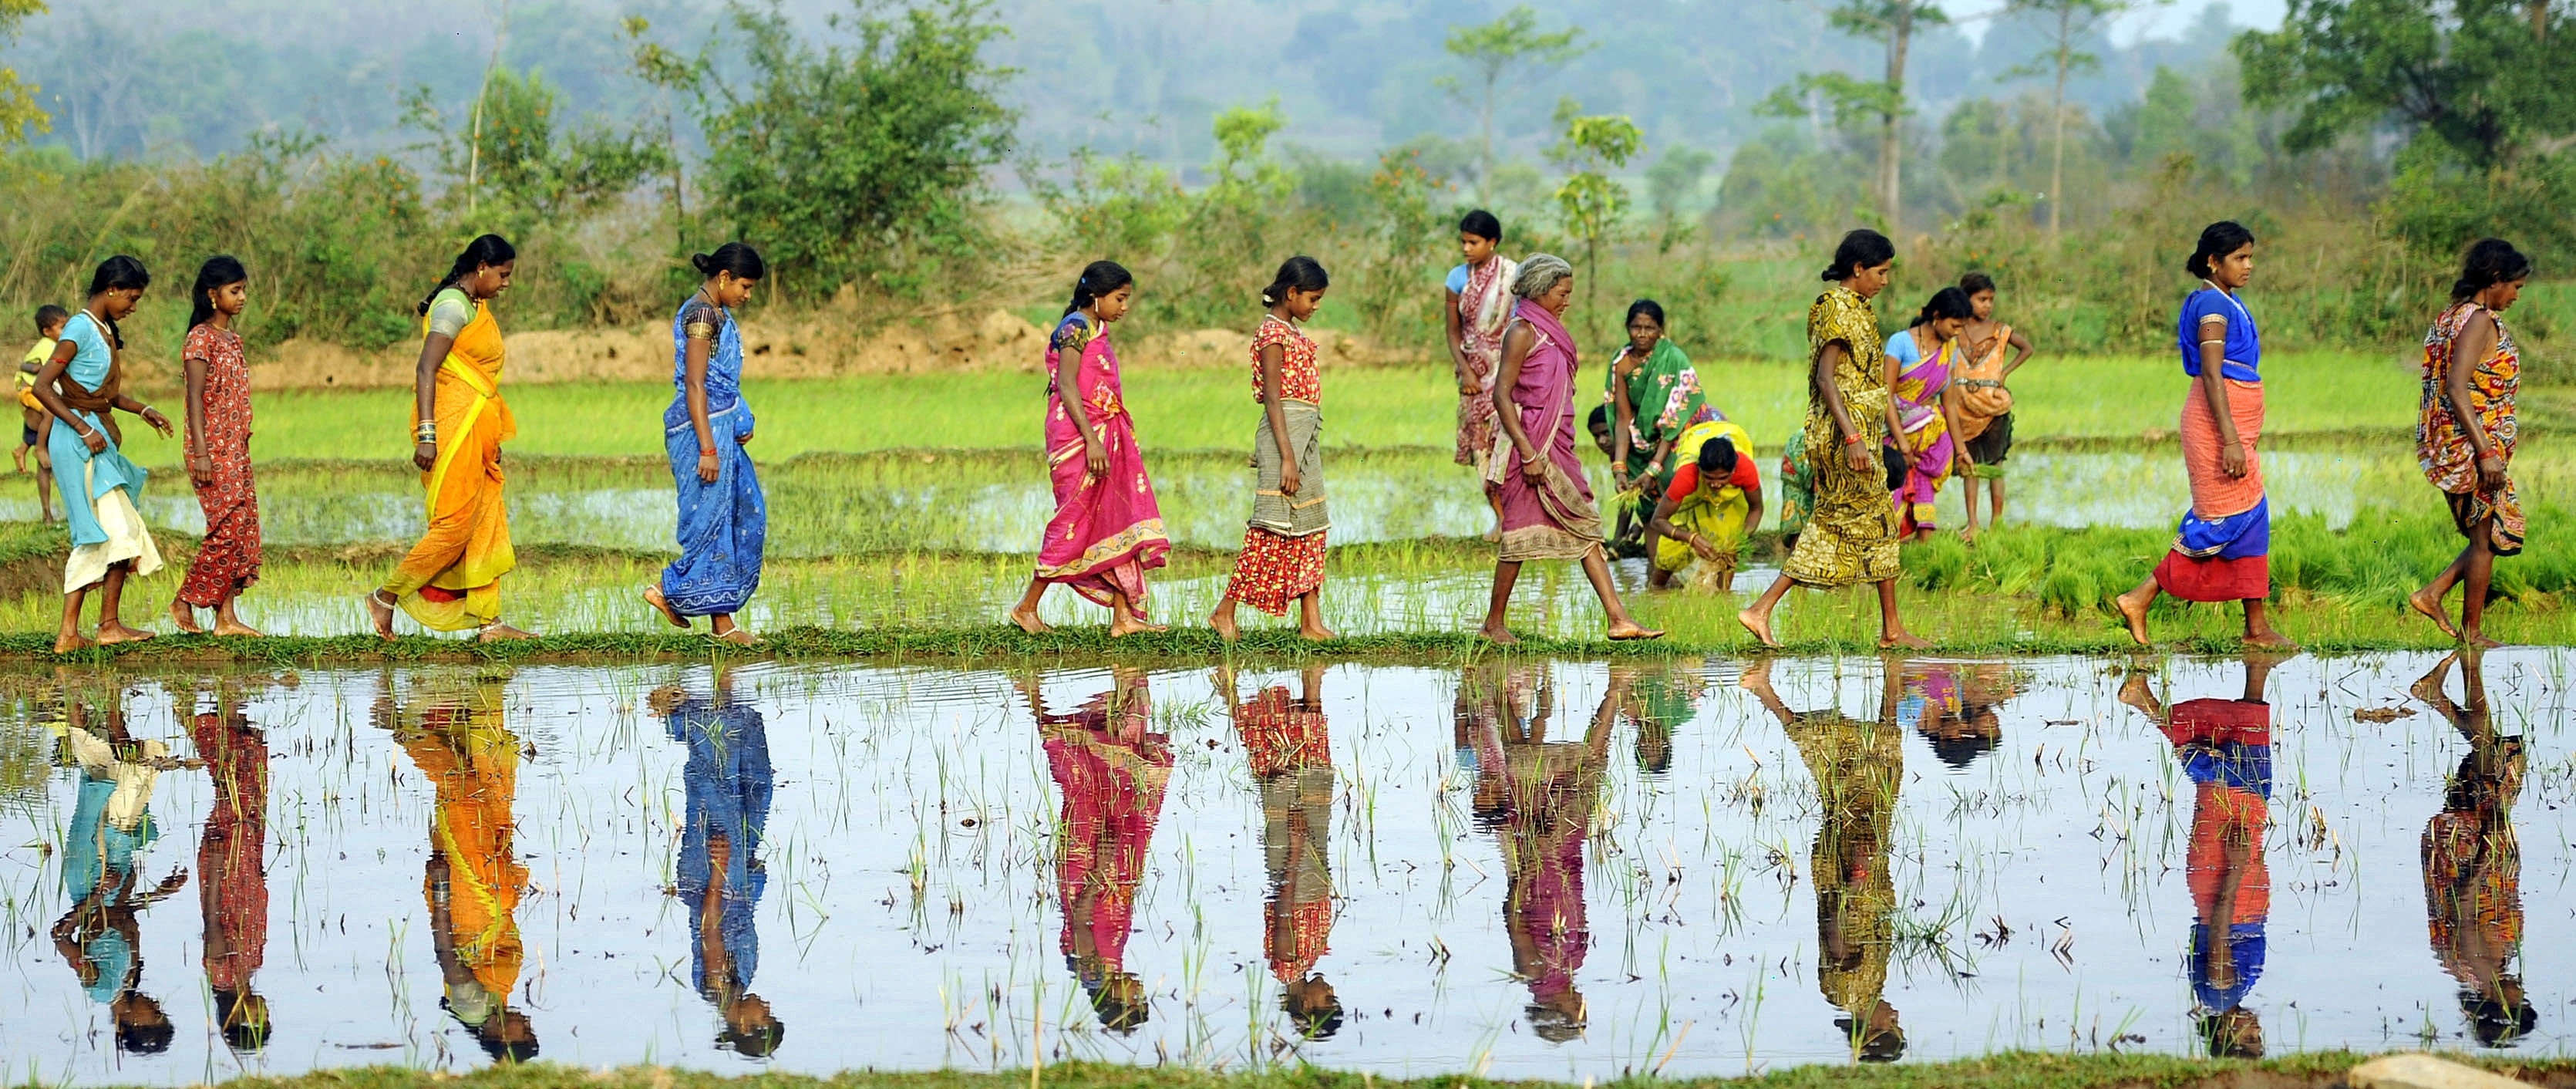 Women Walking Across Rice Paddy in India